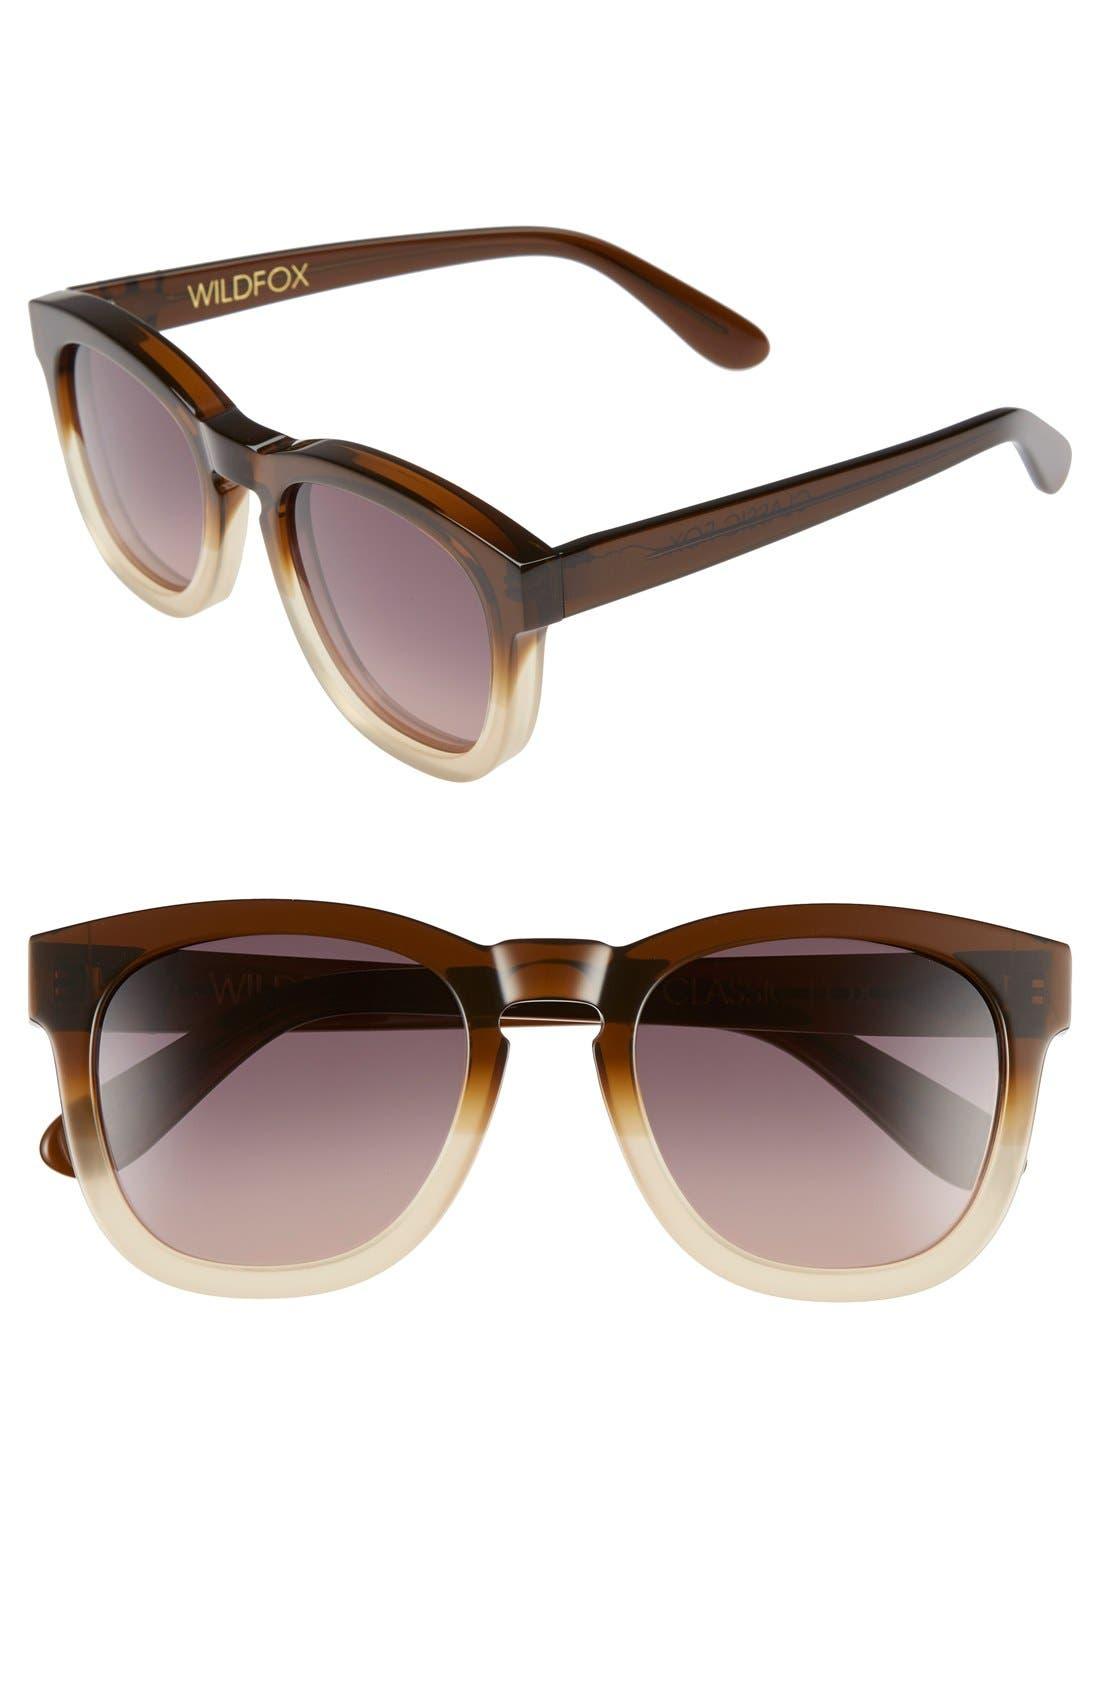 Alternate Image 1 Selected - Wildfox 'Classic Fox' 50mm Retro Sunglasses